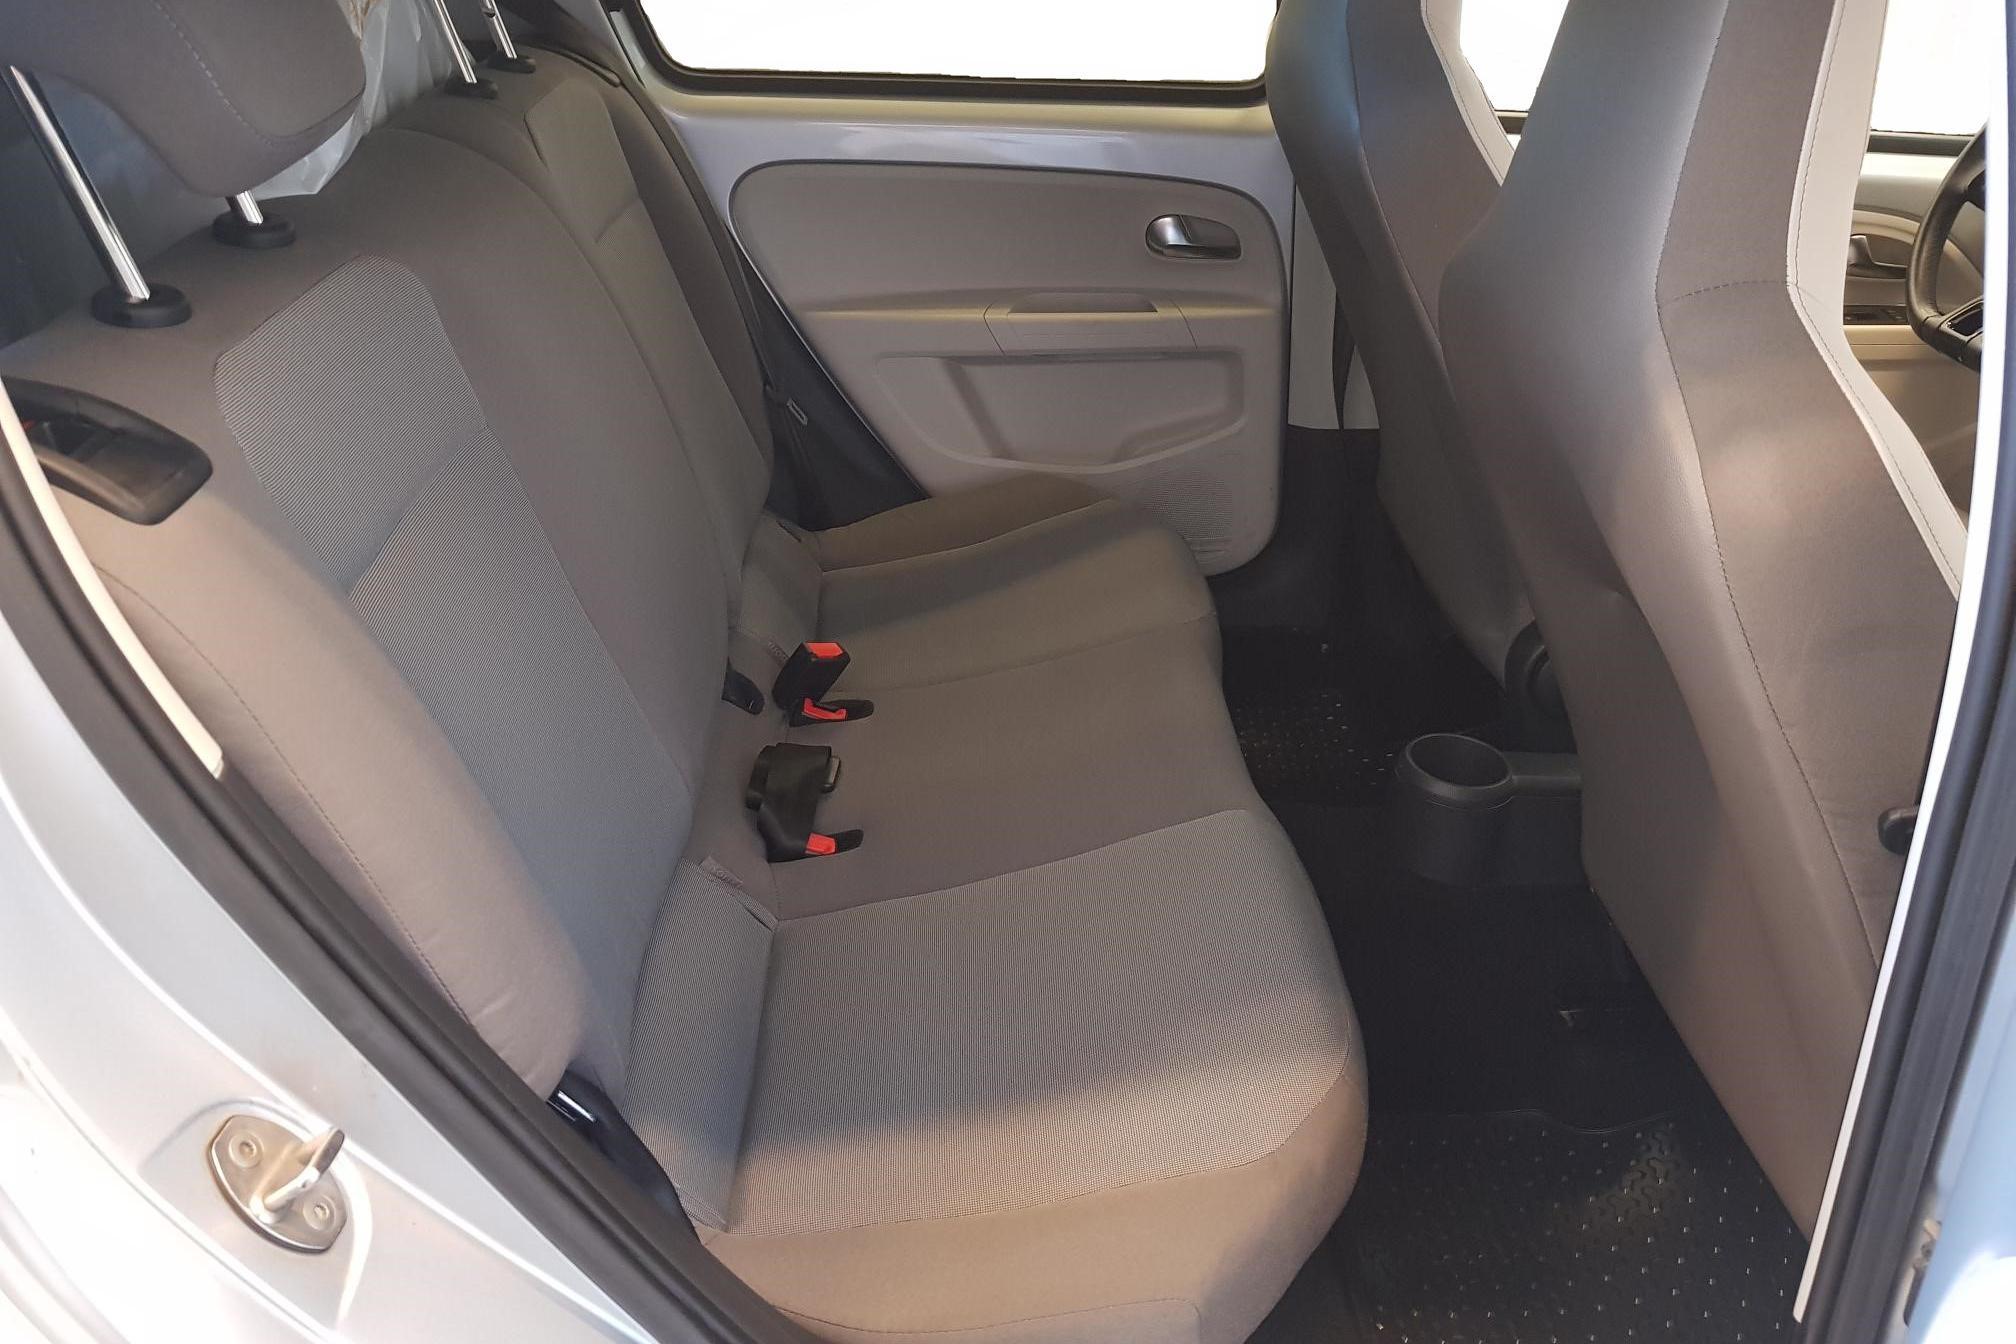 VW e-up! (82hk) - 43 090 km - Automatic - silver - 2014